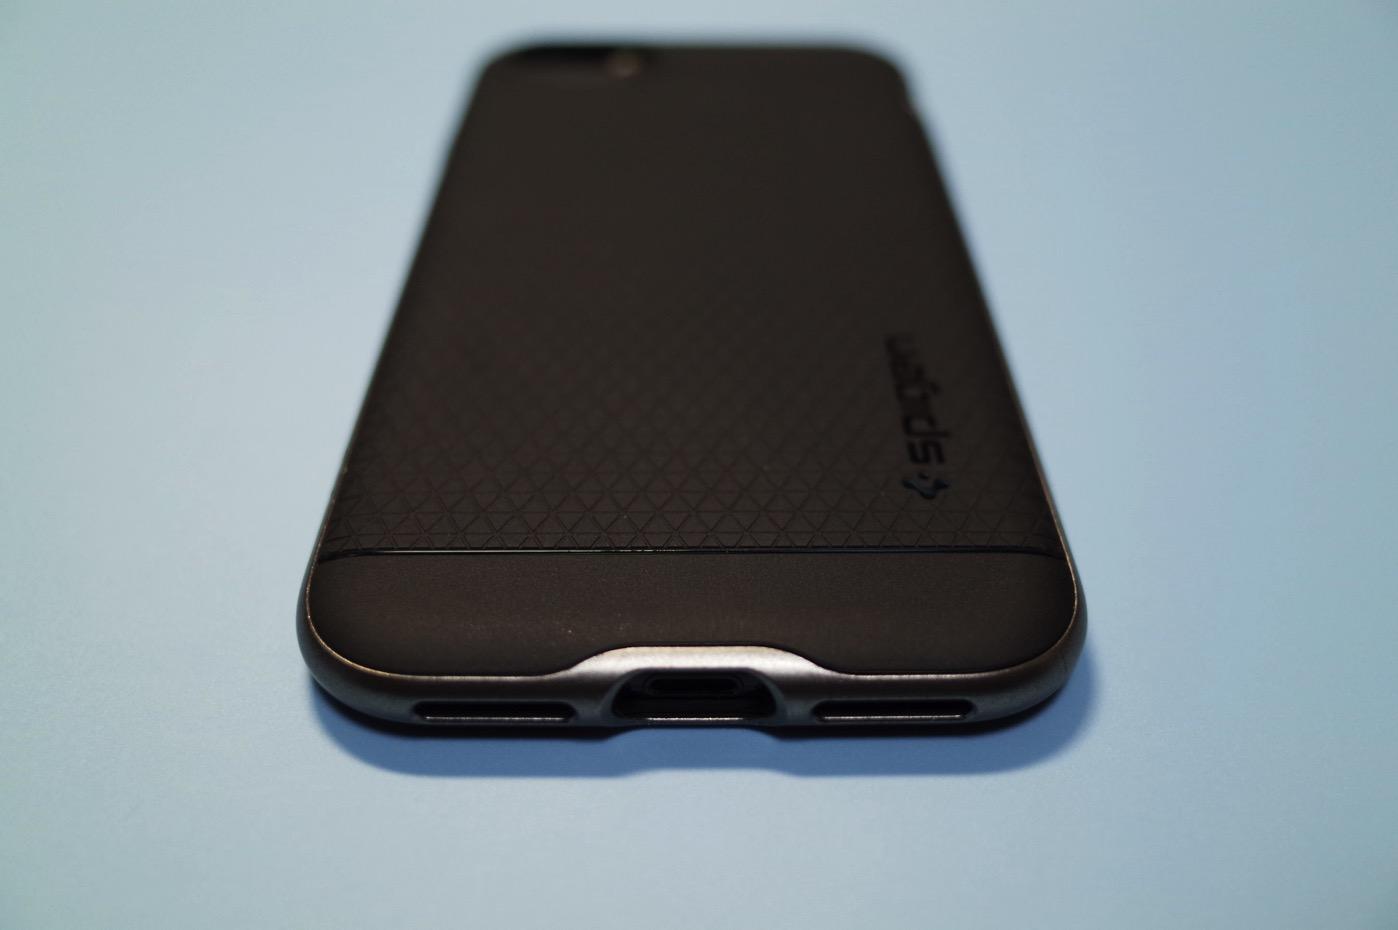 iPhoneケース「ネオ・ハイブリッド米軍MIL規格取得 二重構造バンパー」-12